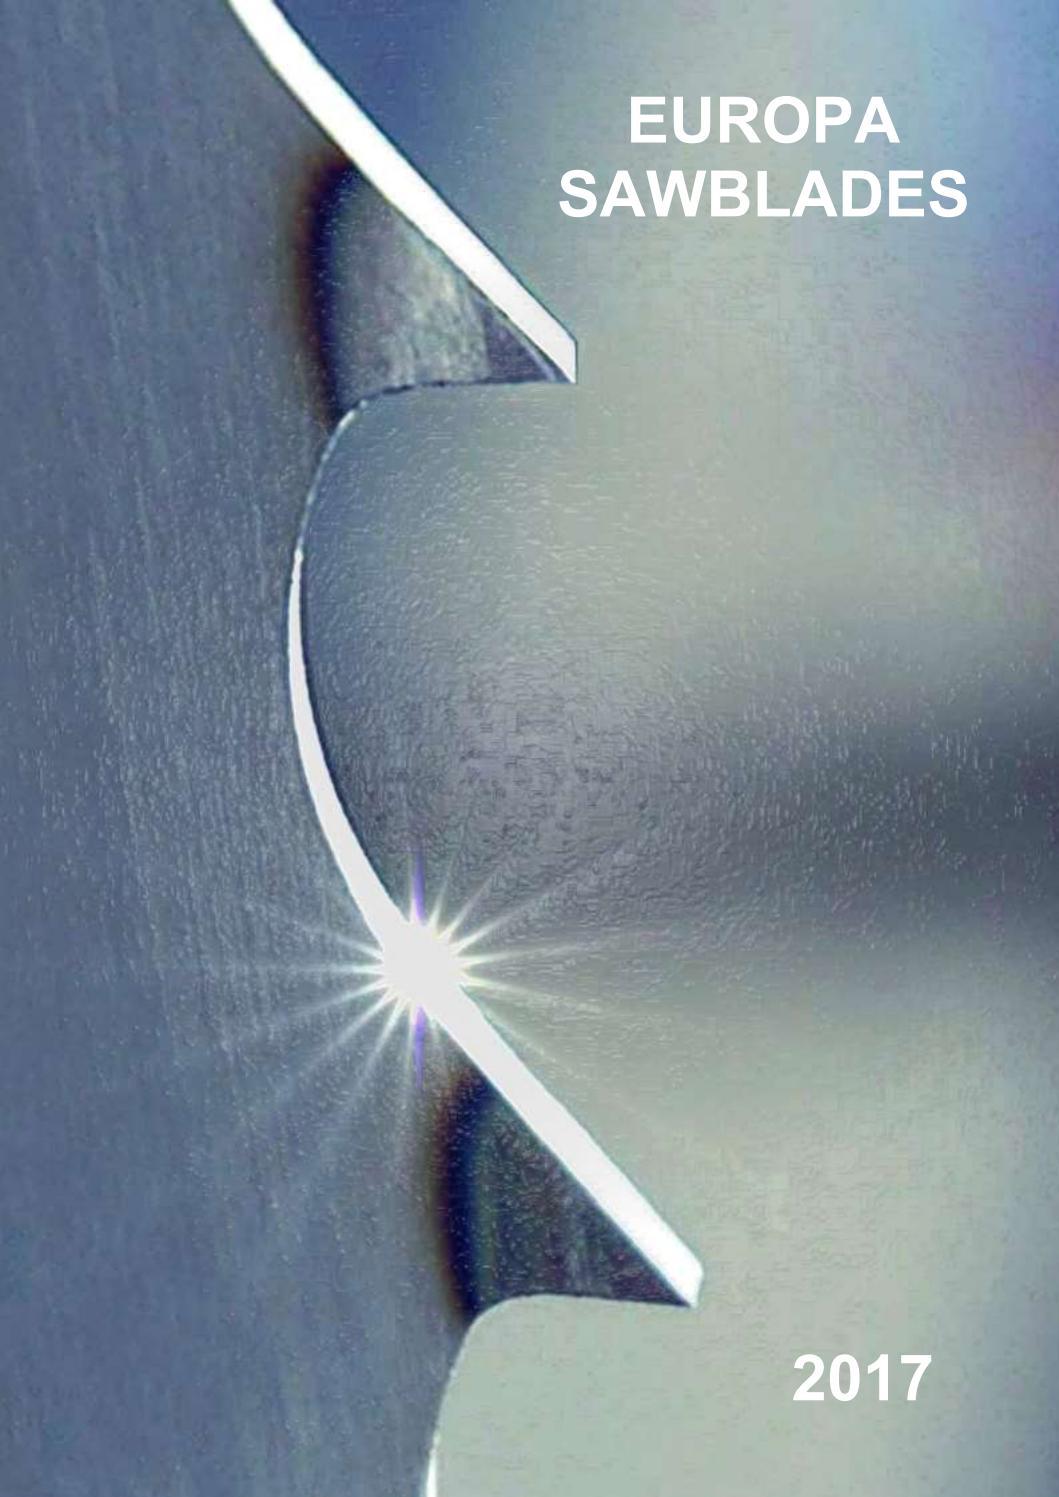 "Wood Mizer Bandsaw Blade 12/' 144/"" x 1-1//4/"" x 042 x 7//8 7° Band Saw Mill Blade"